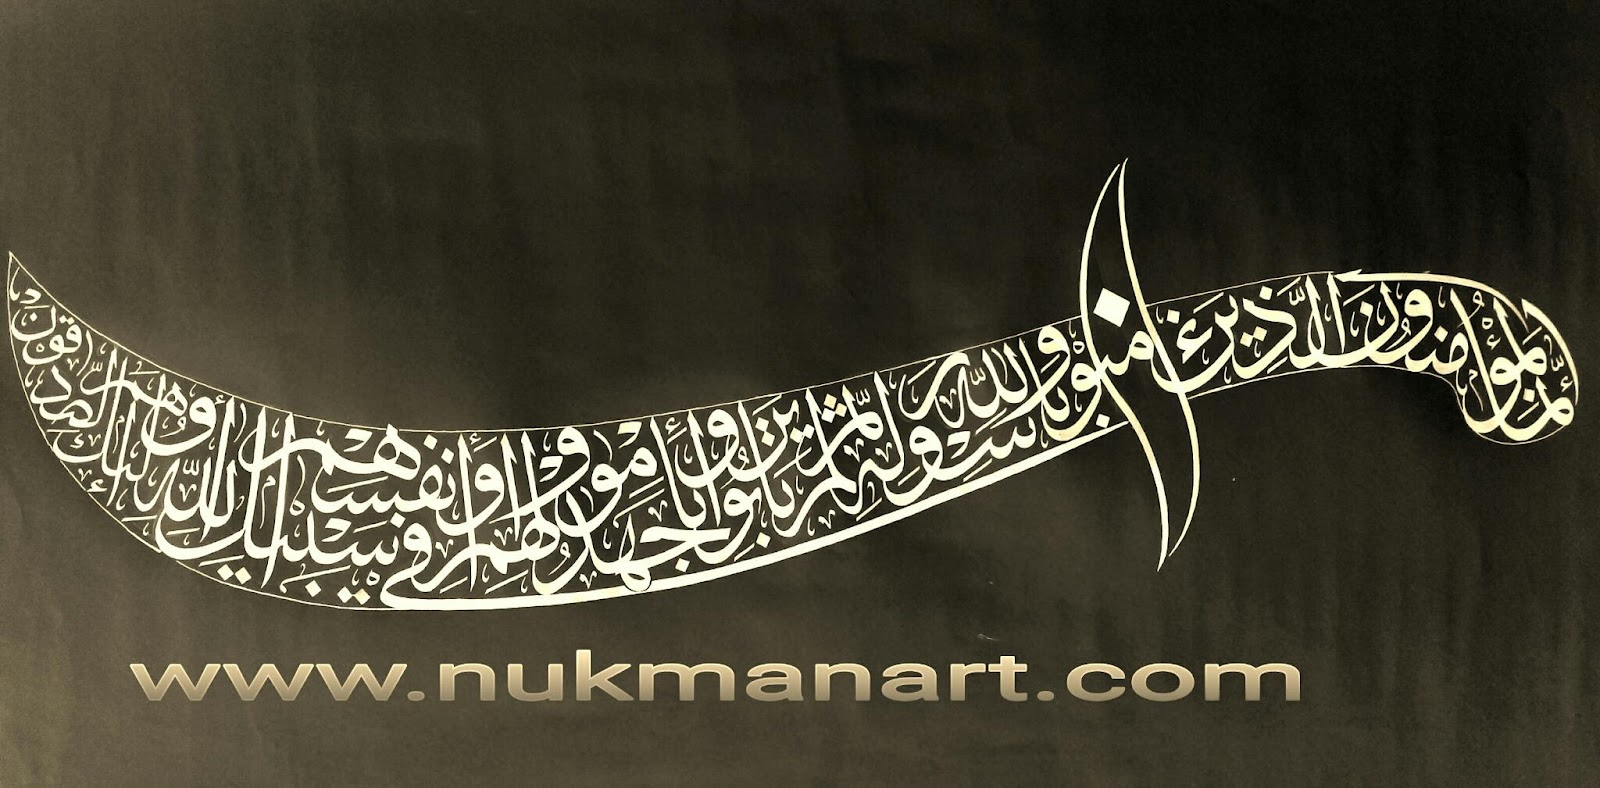 Gambar Kaligrafi Pedang Cikimm Com